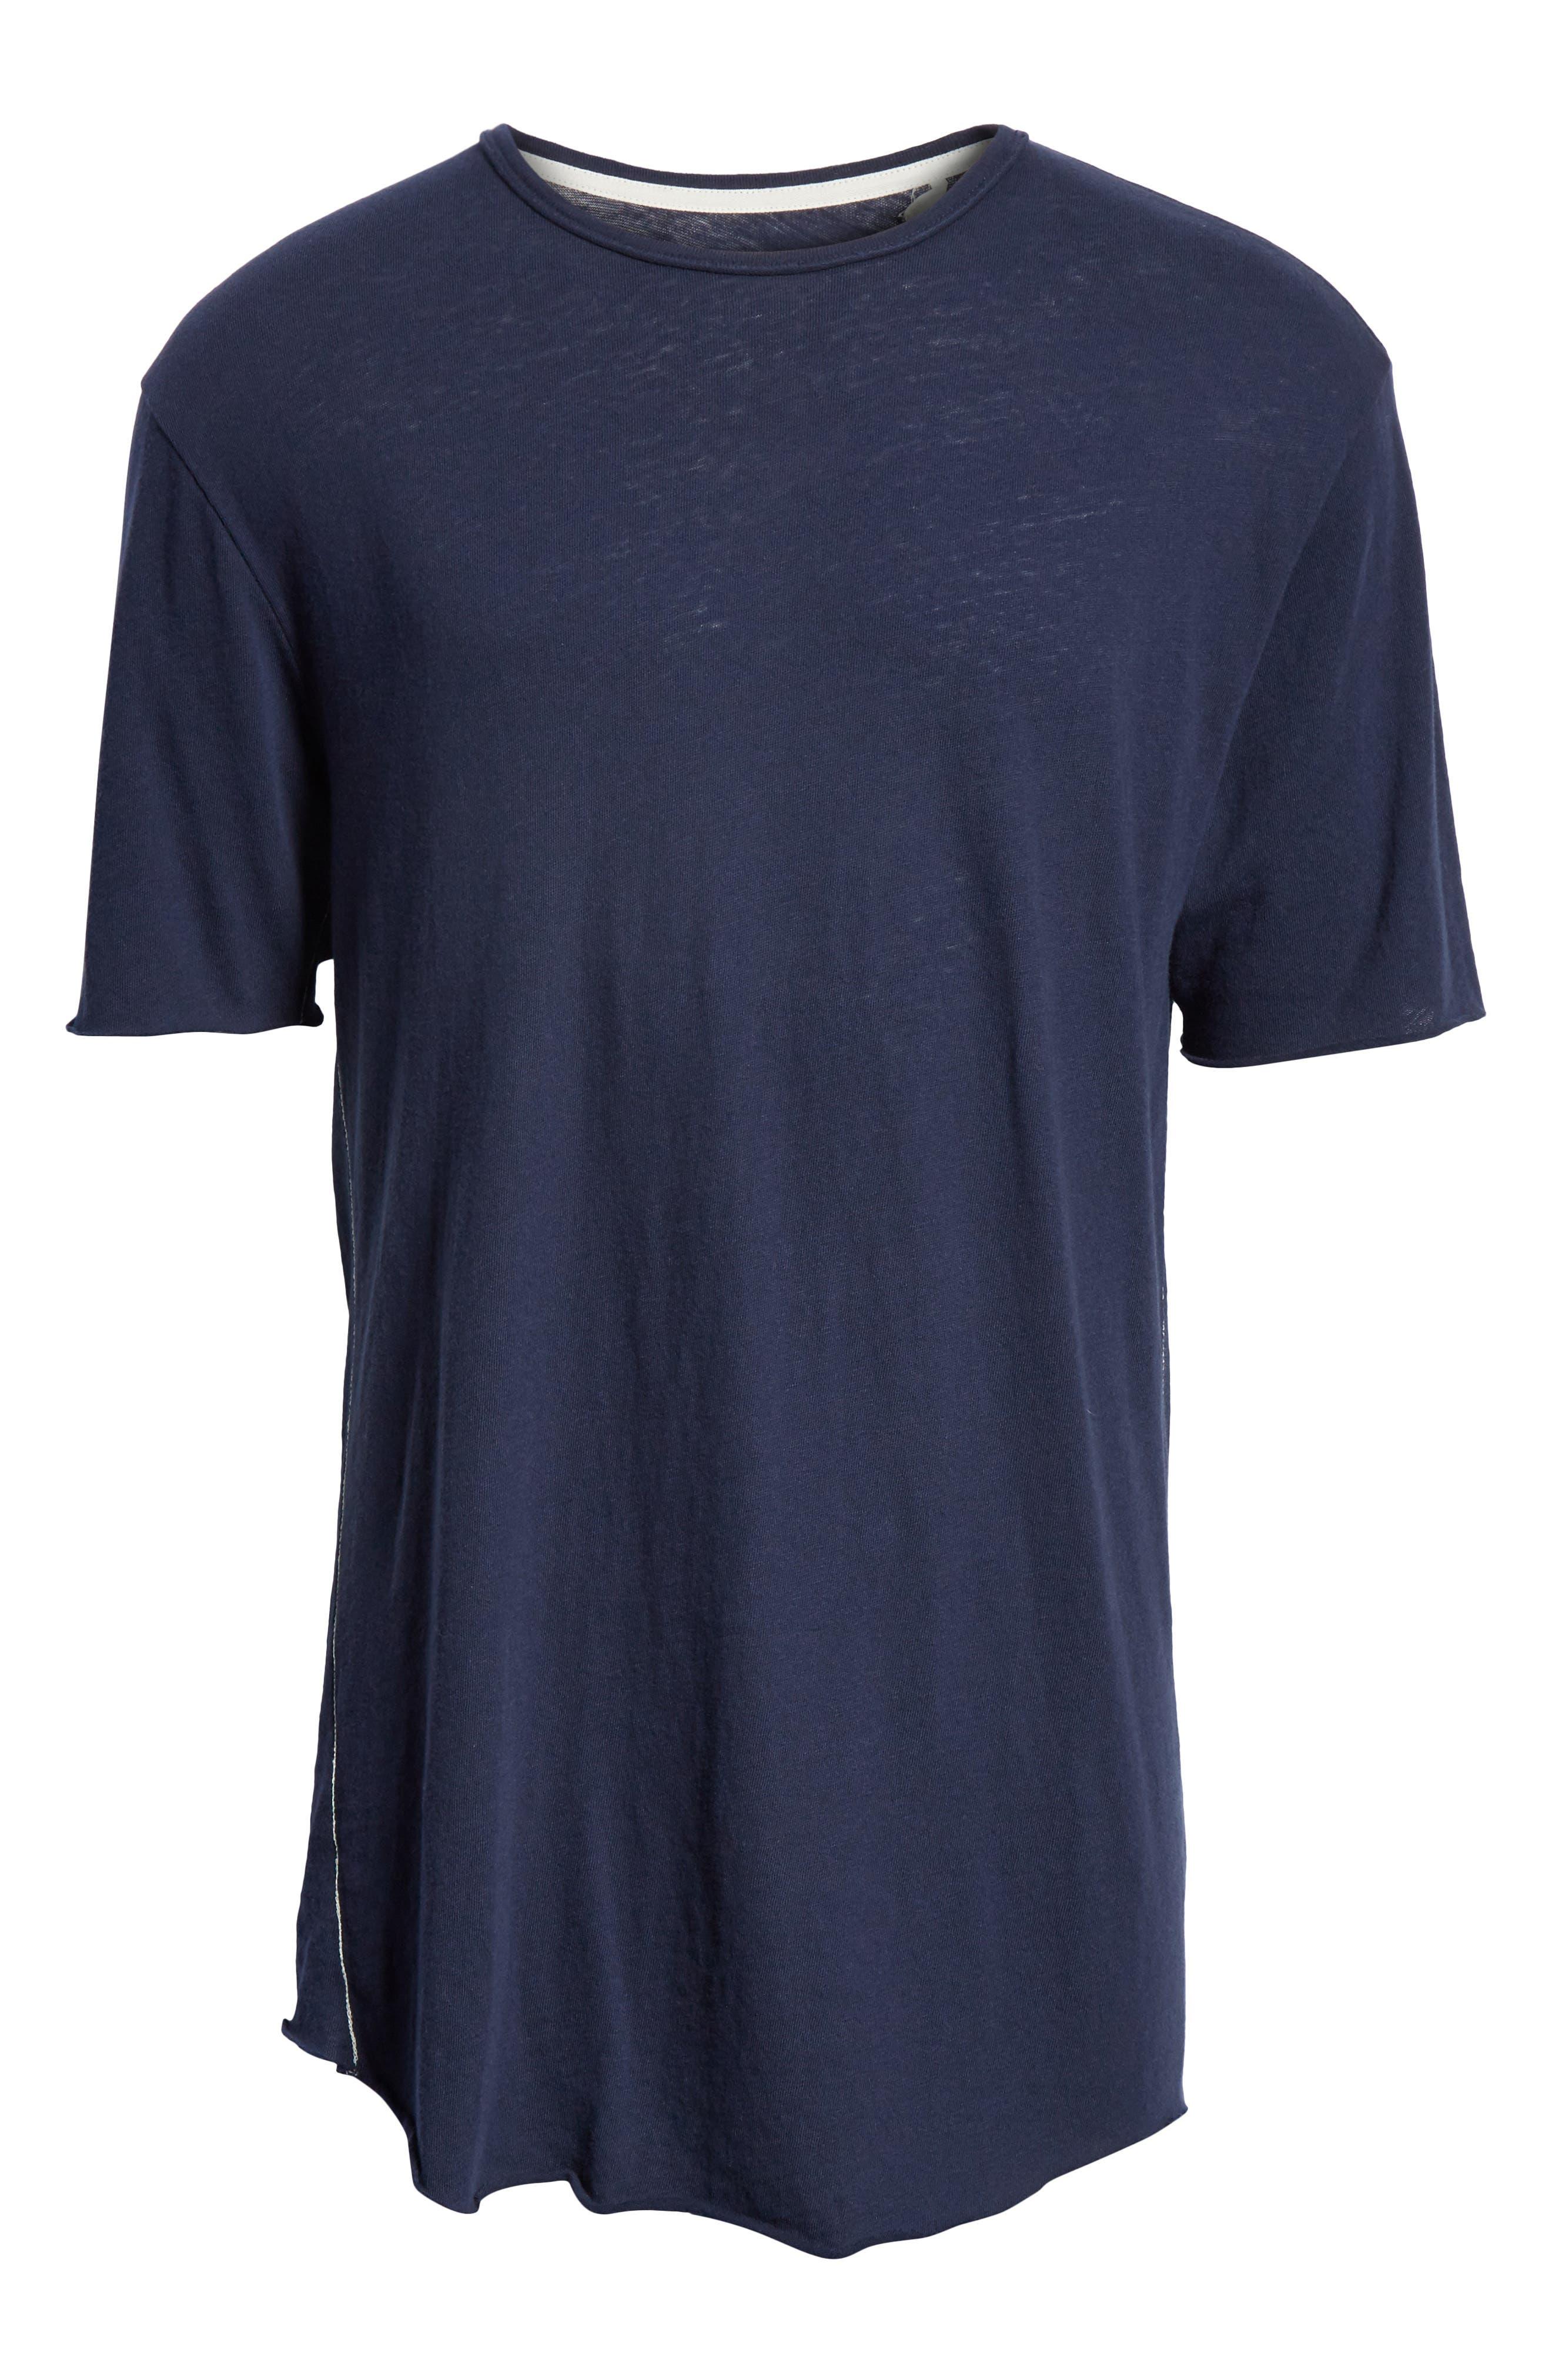 Hartley Crewneck Cotton & Linen T-Shirt,                             Alternate thumbnail 6, color,                             410